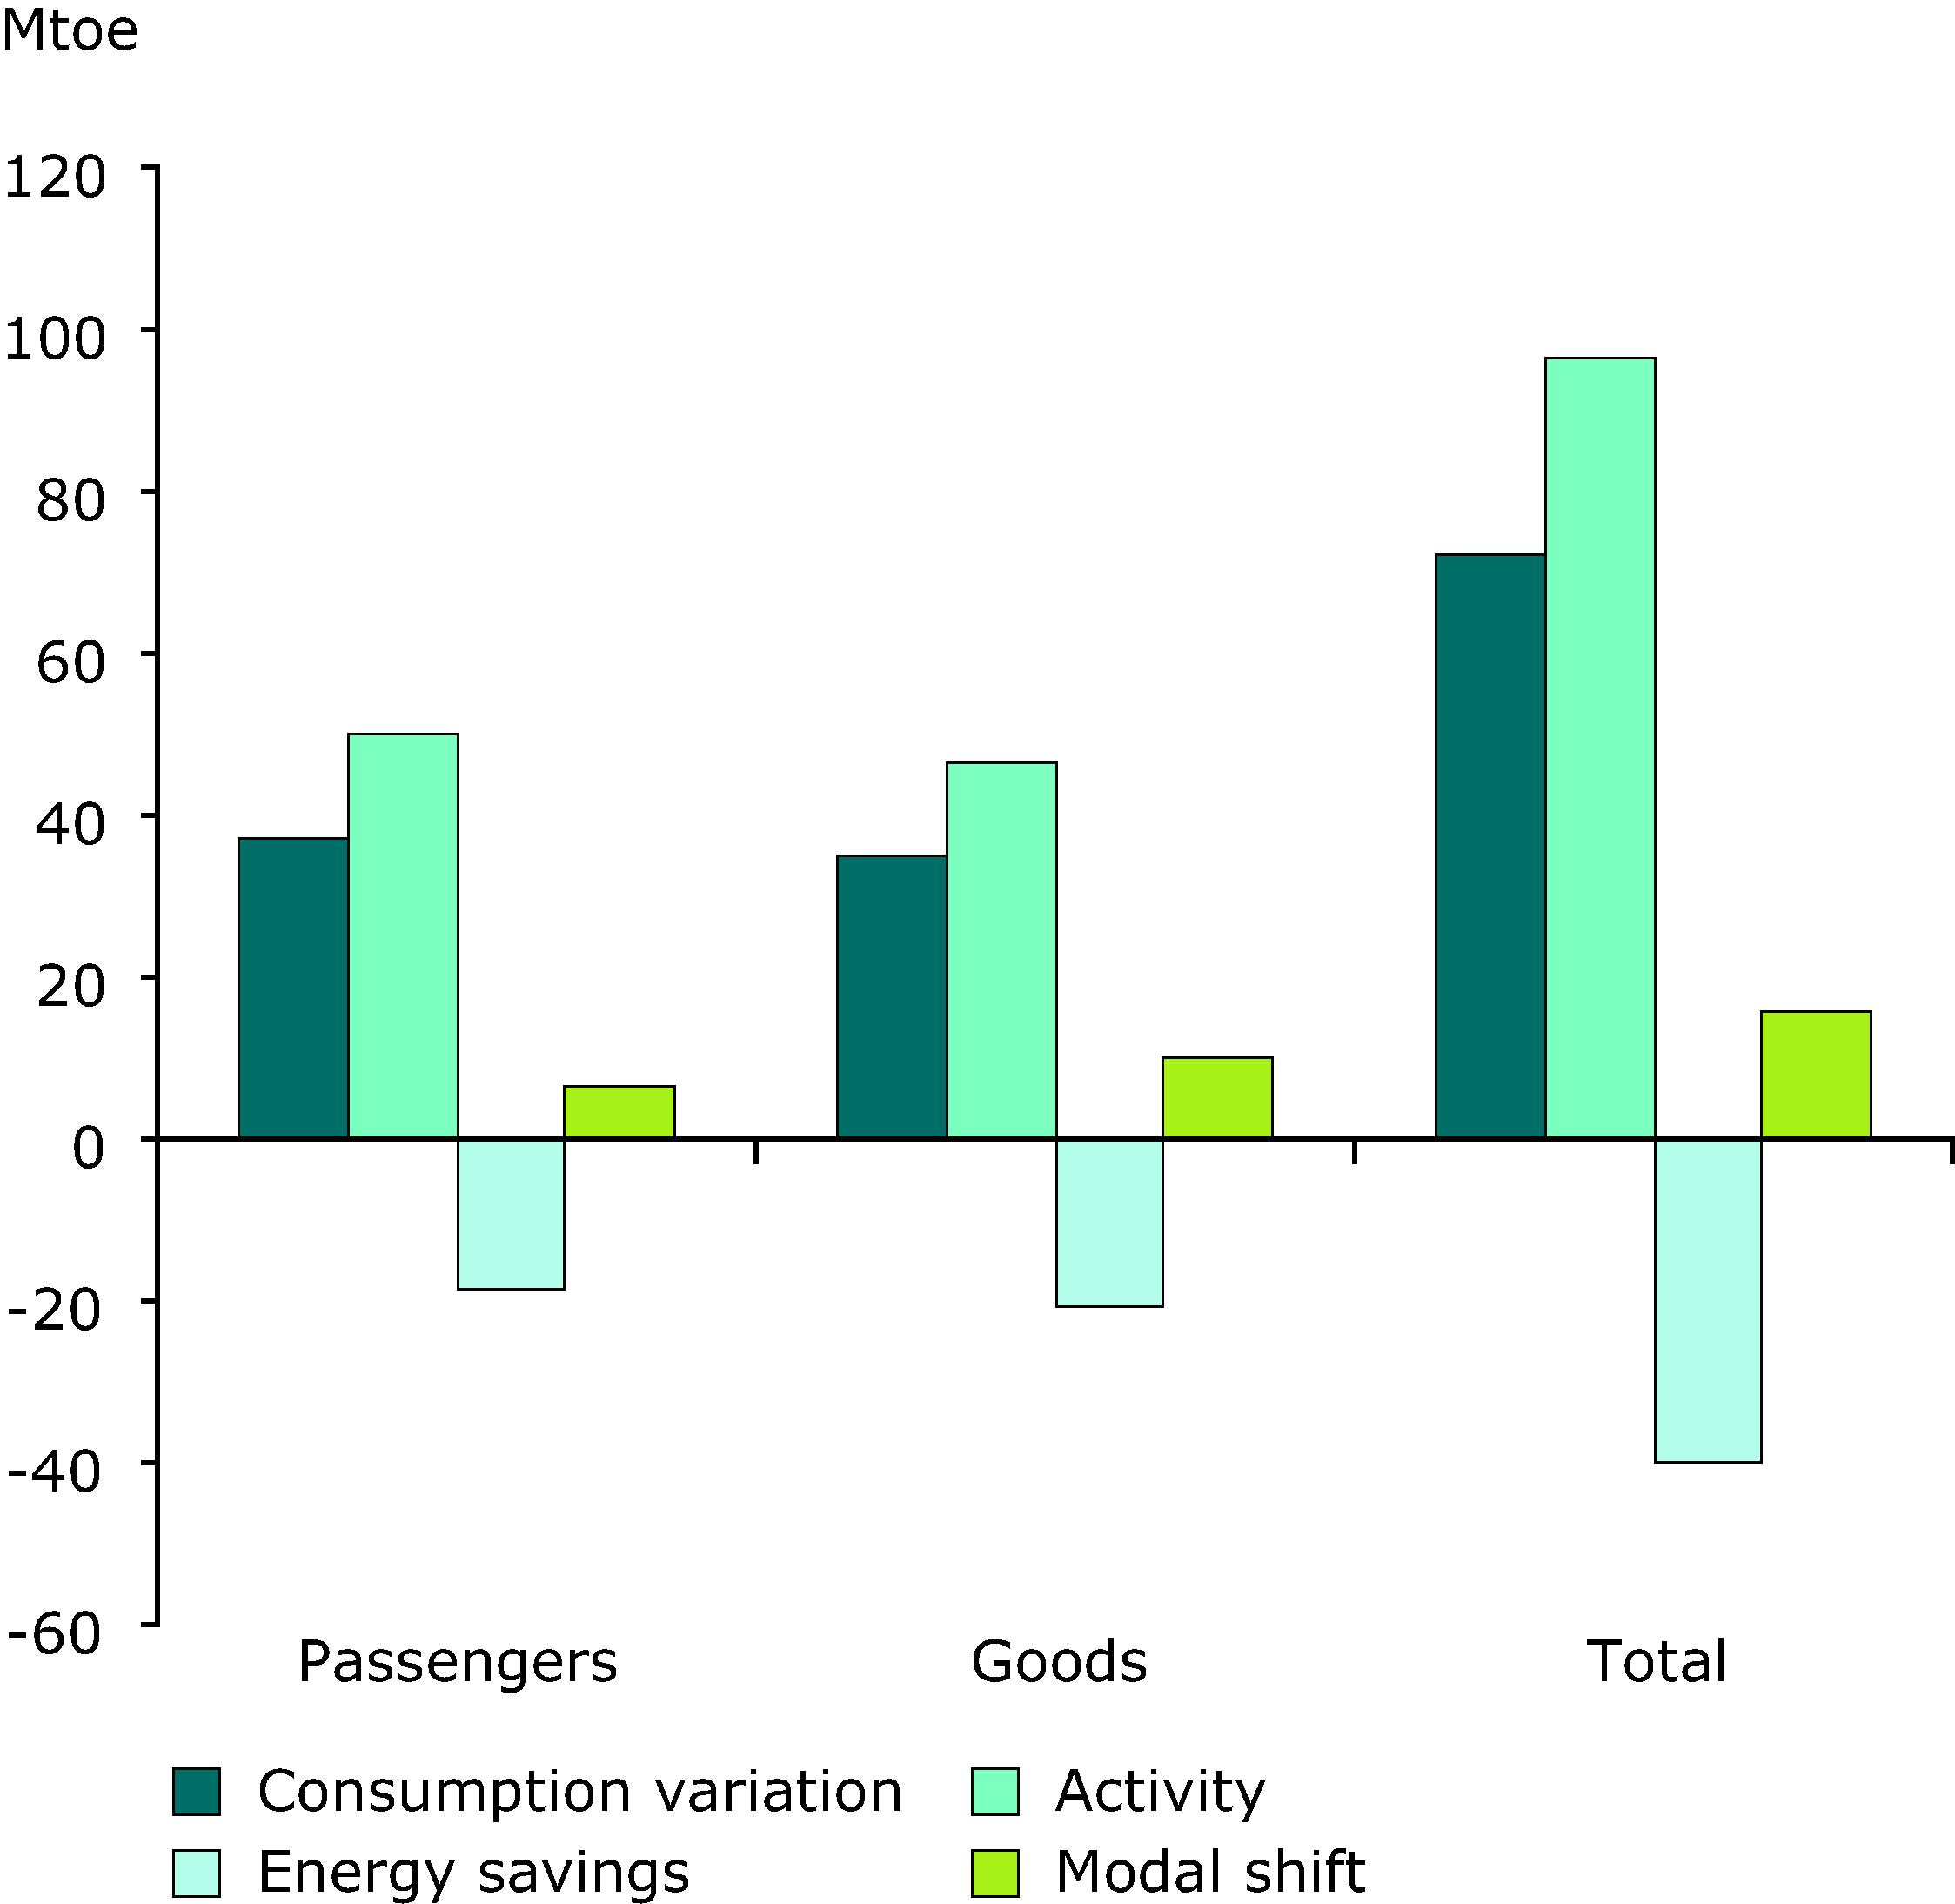 Breakdown of energy consumption variation of transport in EU-27 (1990-2007)